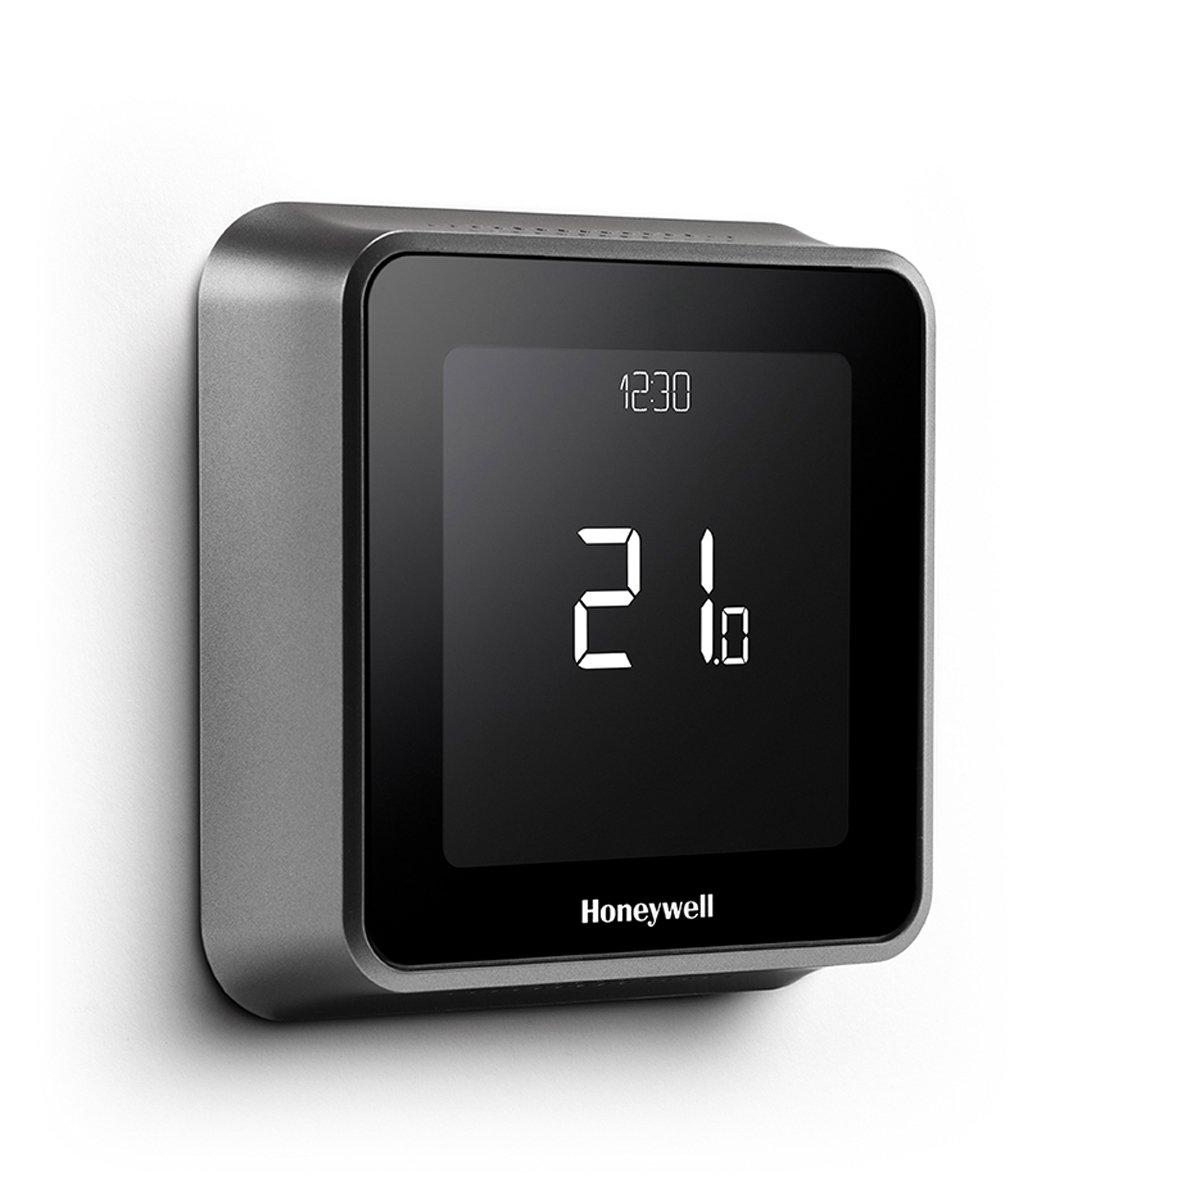 Honeywell Lyric T6 Wi-Fi Raumthermostat mit Verdrahteter ...